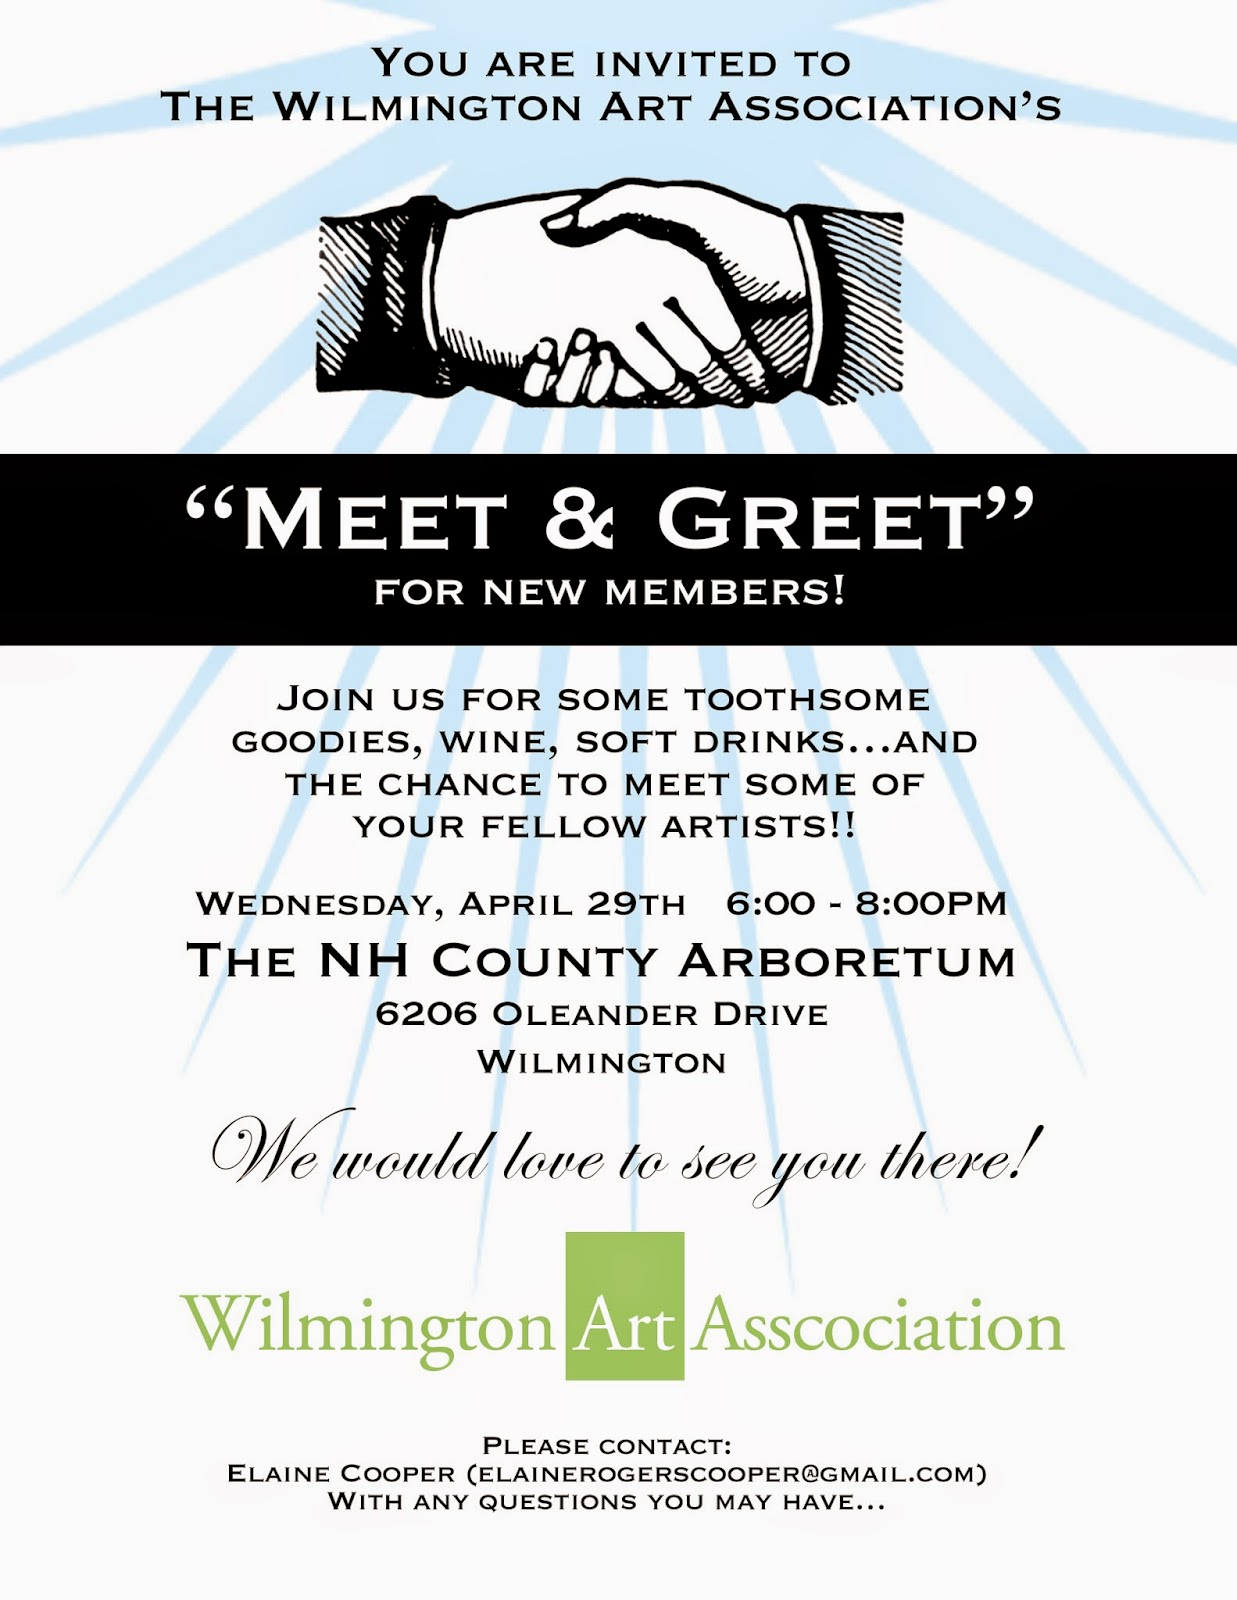 Wilmington art association eblast meet and greet invitation meet and greet invitation m4hsunfo